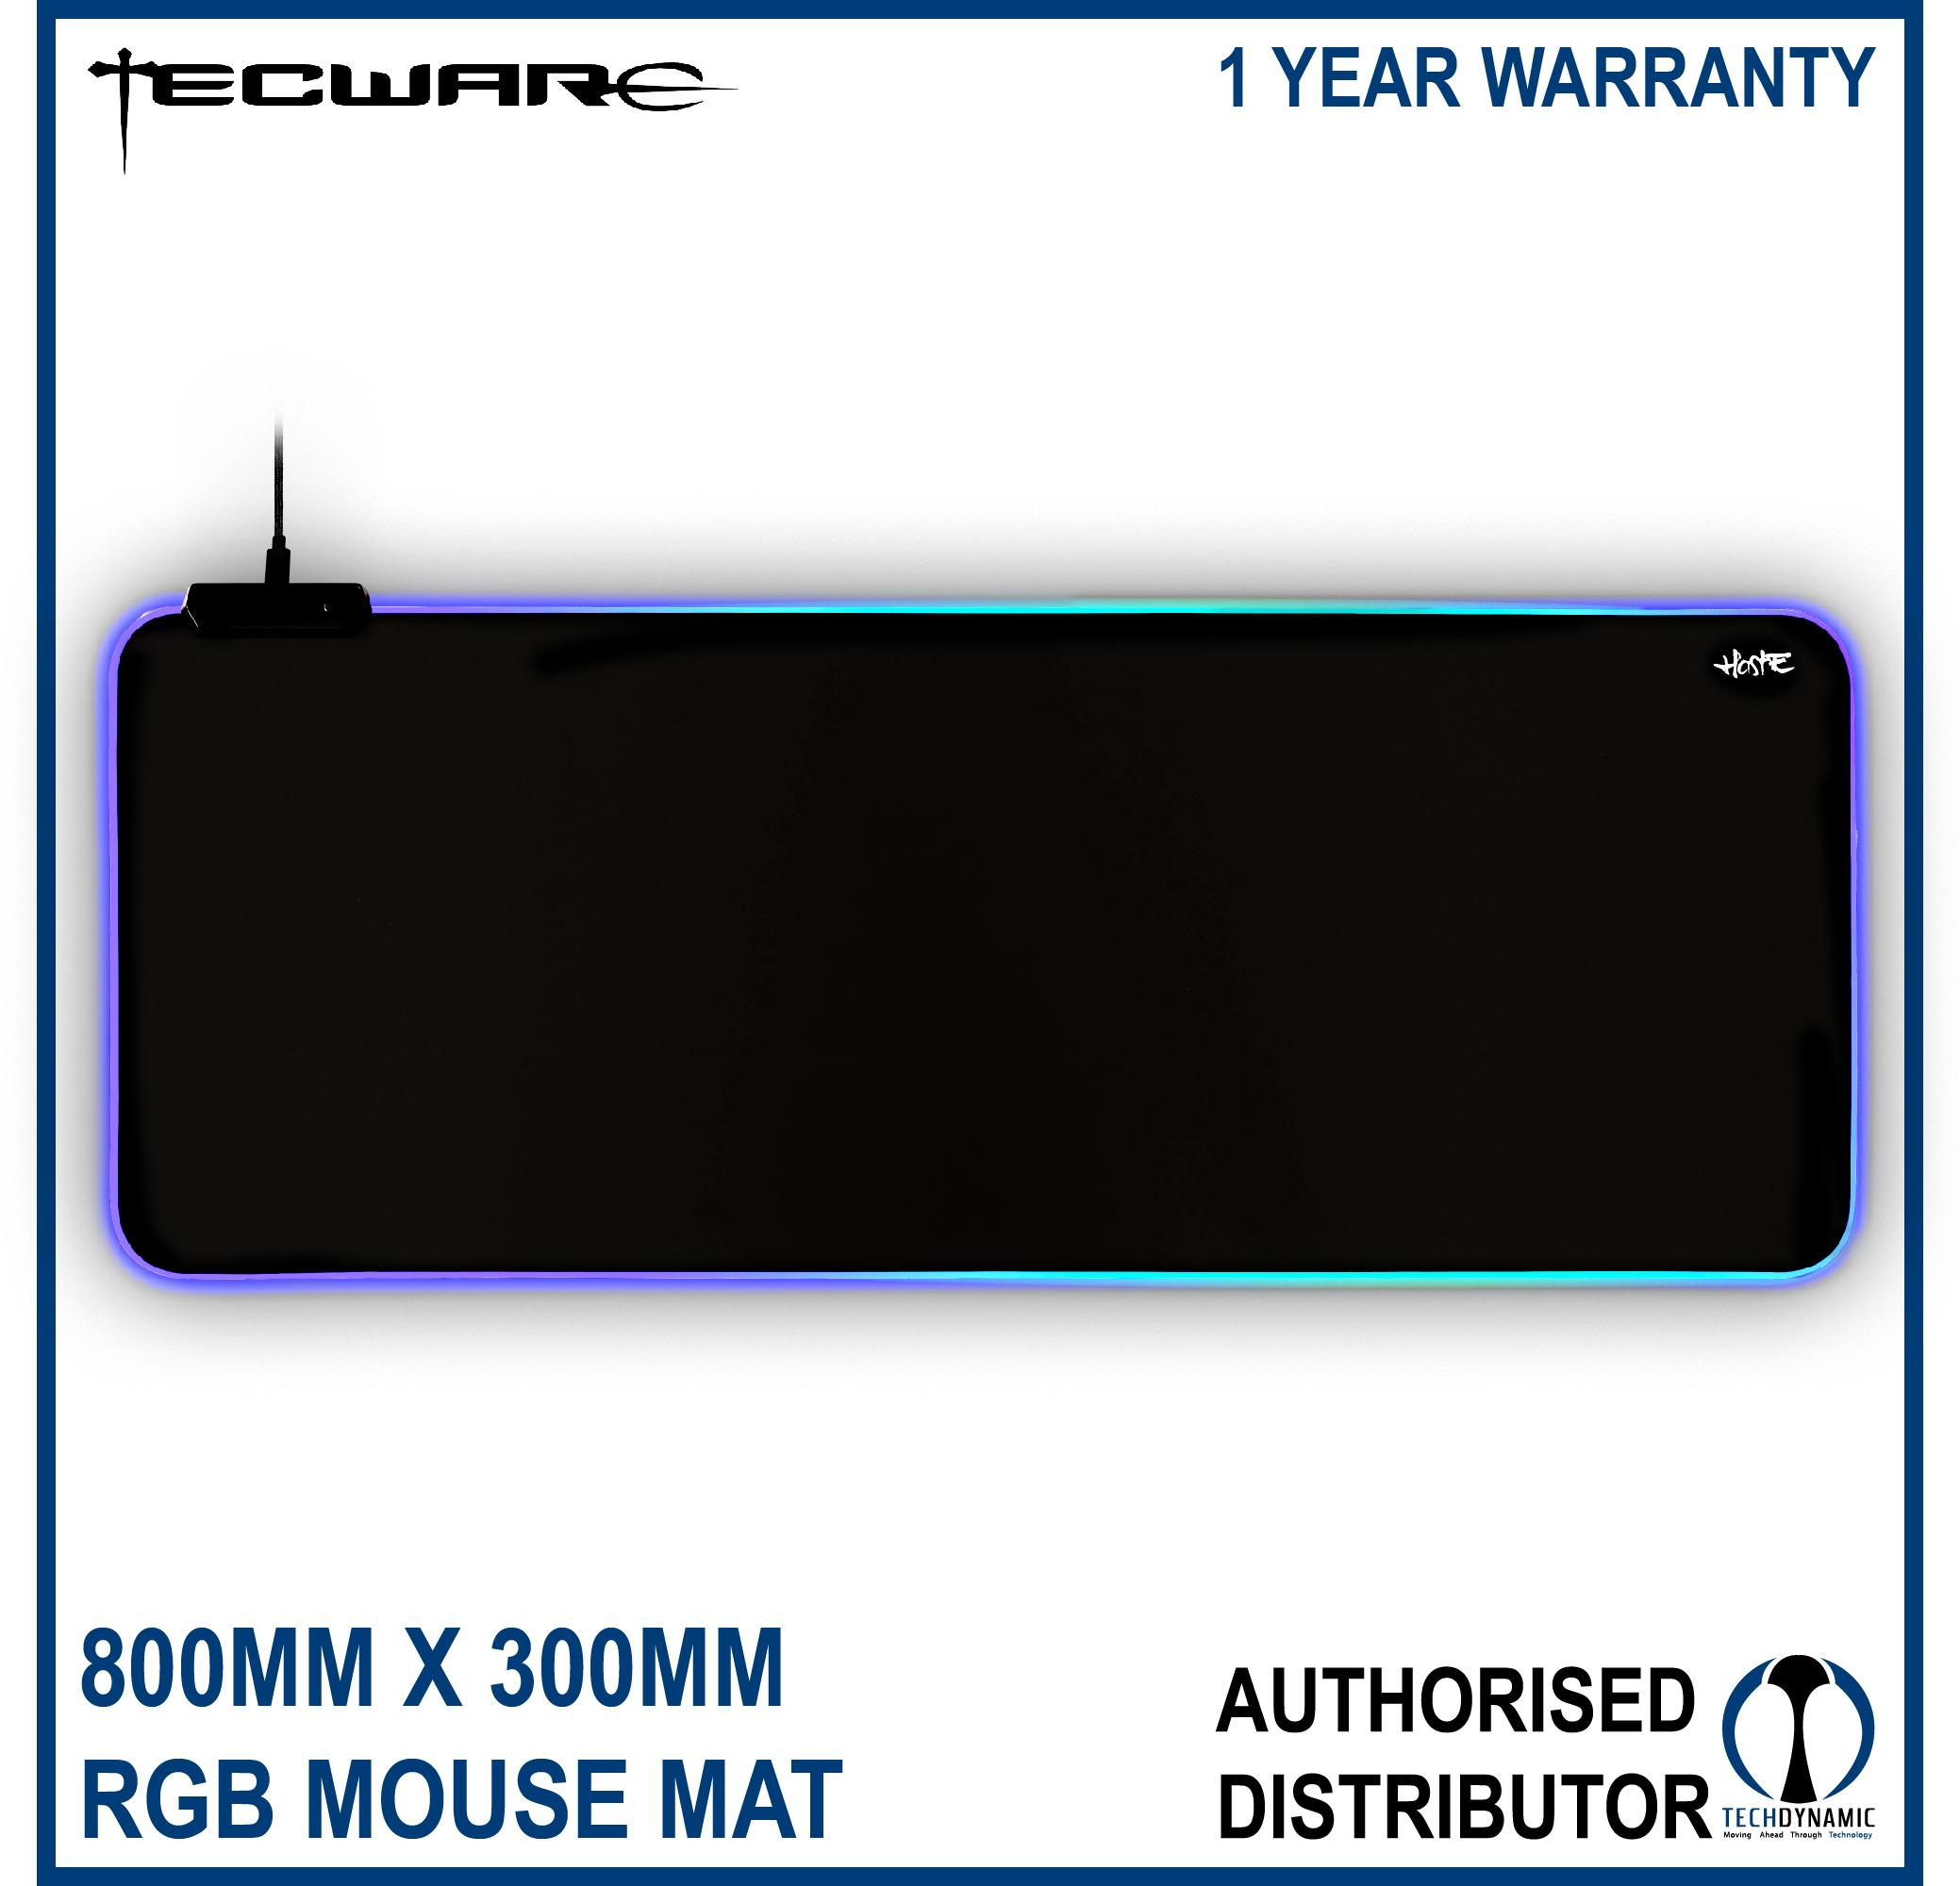 Tecware Haste XL RGB Mouse Mat